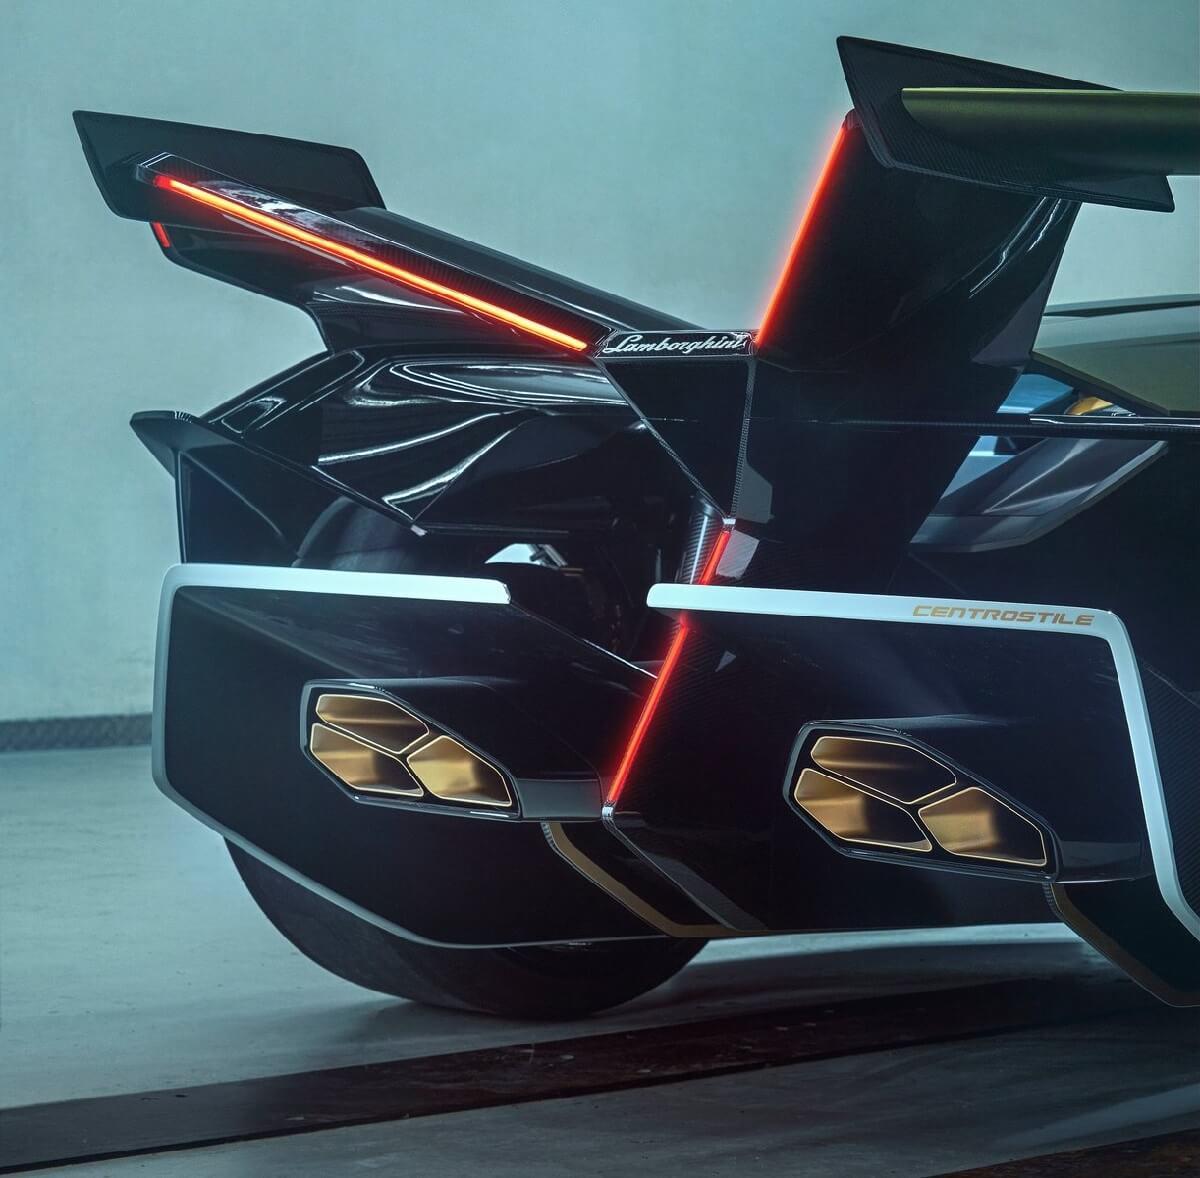 Lamborghini-Lambo_V12_Vision_Gran_Turismo_Concept-12.jpg